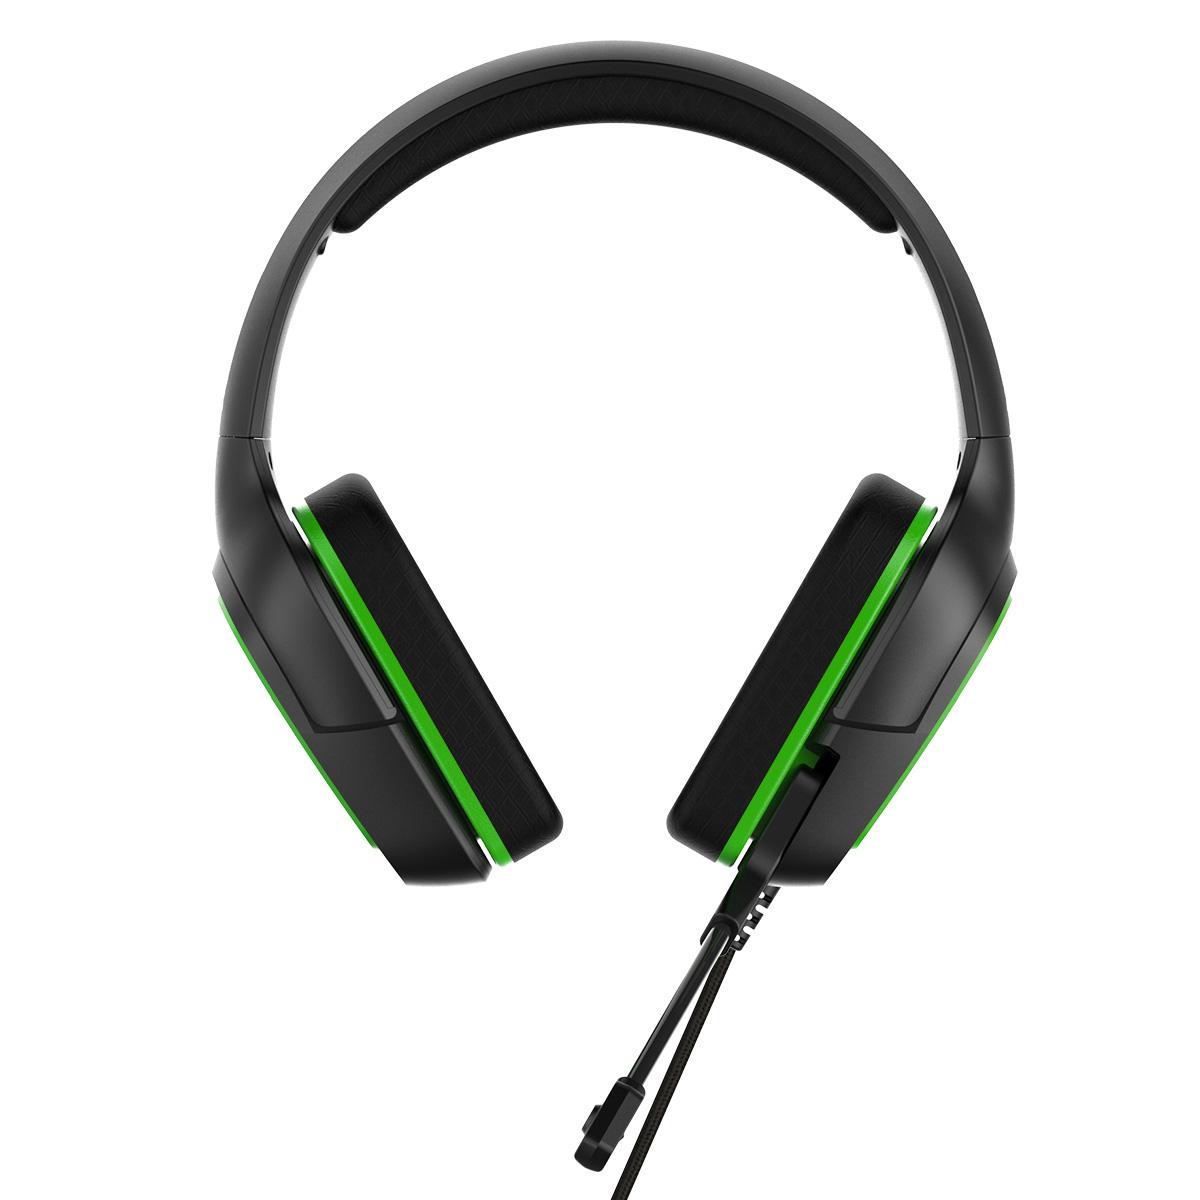 Herní sluchátka s mikrofonem - iPega, PG-R006 Green